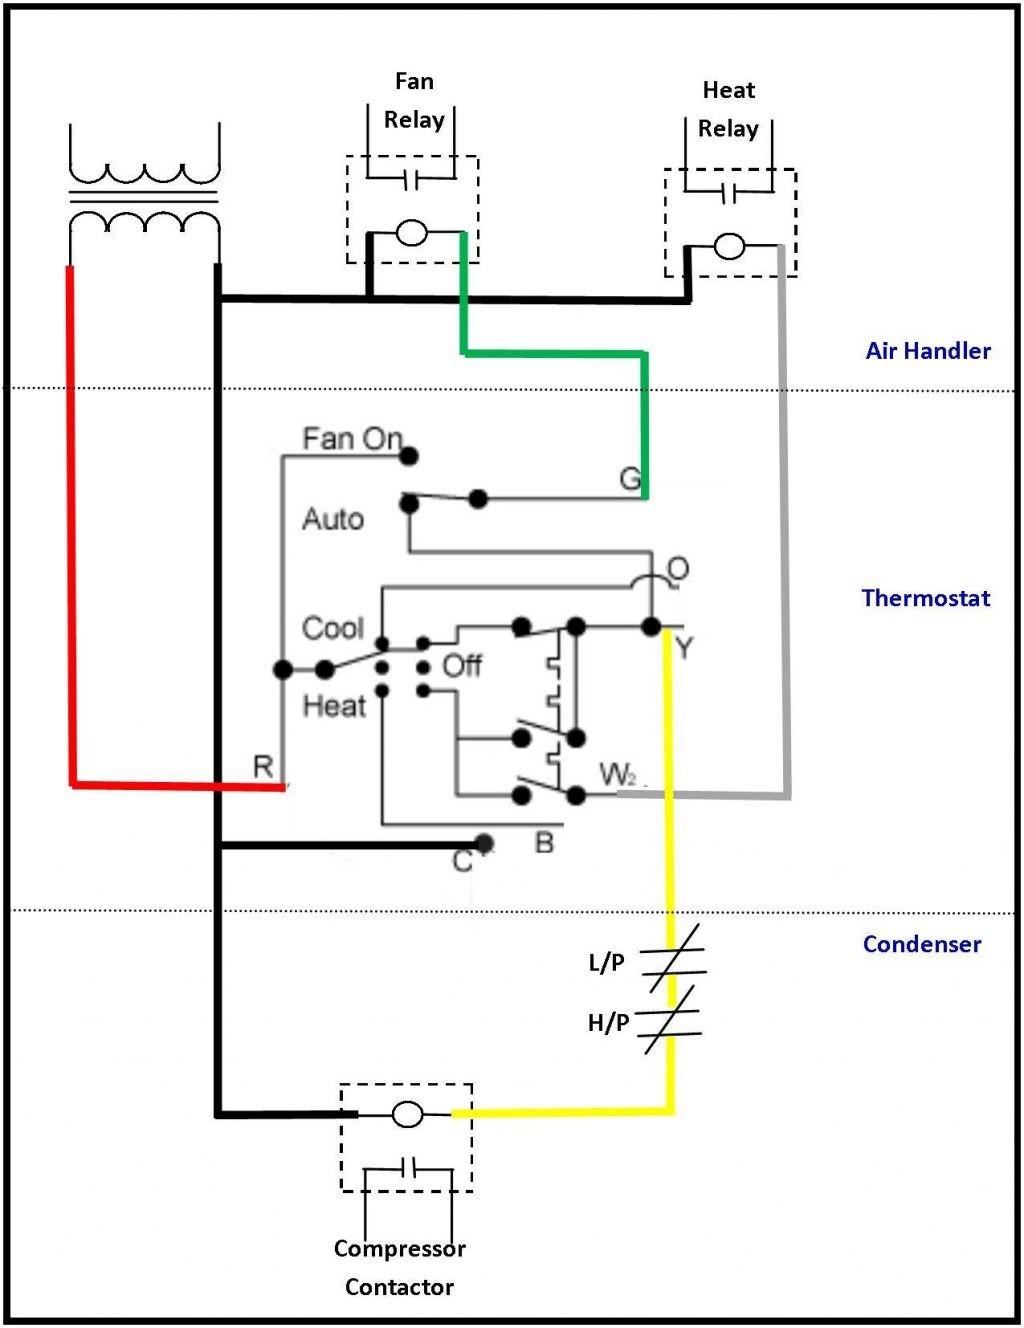 Air Conditionering Diagram Home Unit pressor Condenser Conditioning Pdf Split System